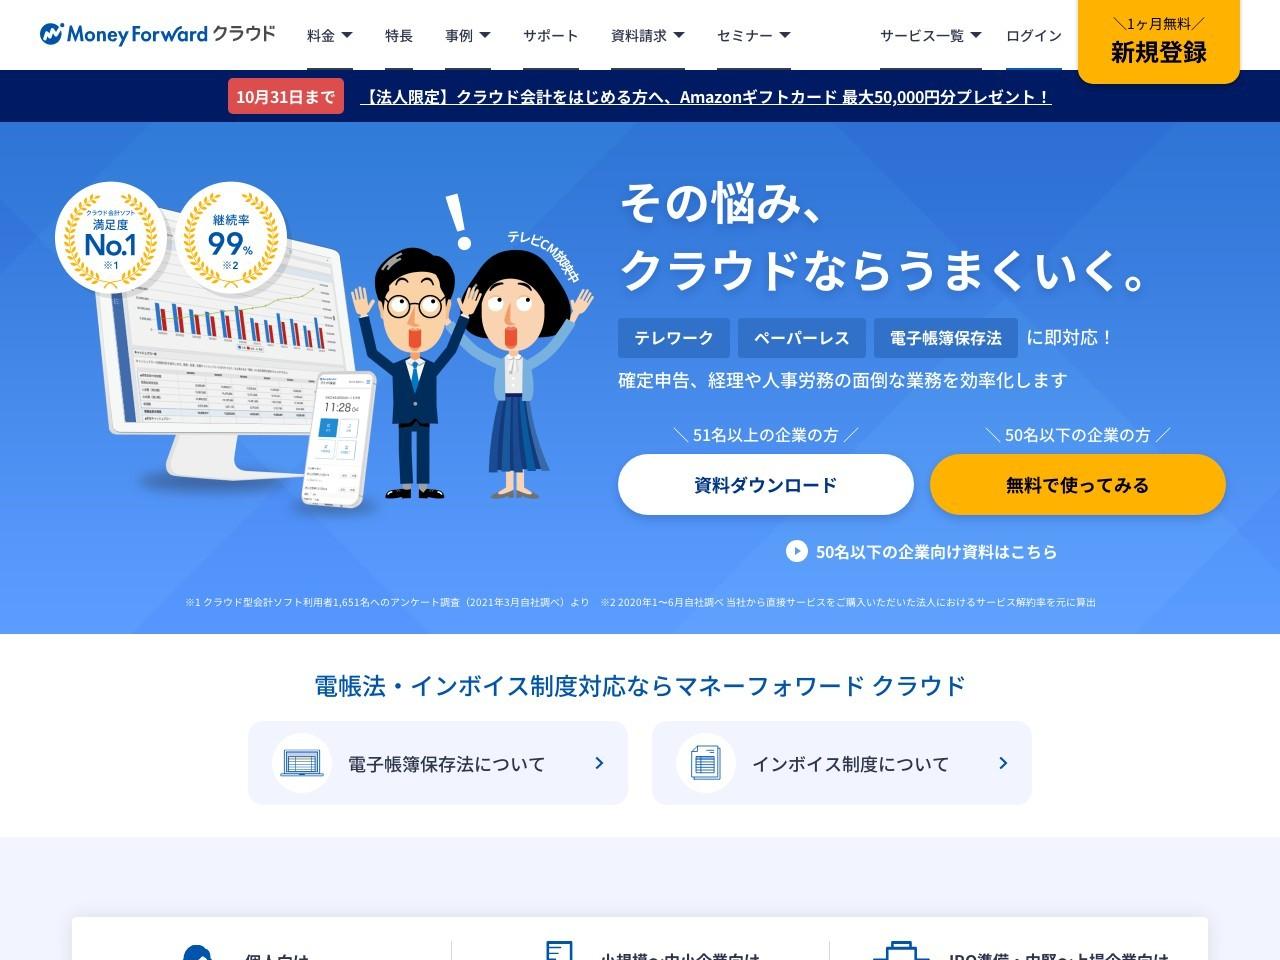 https://biz.moneyforward.com/blog/business-hack/web-service-2015/